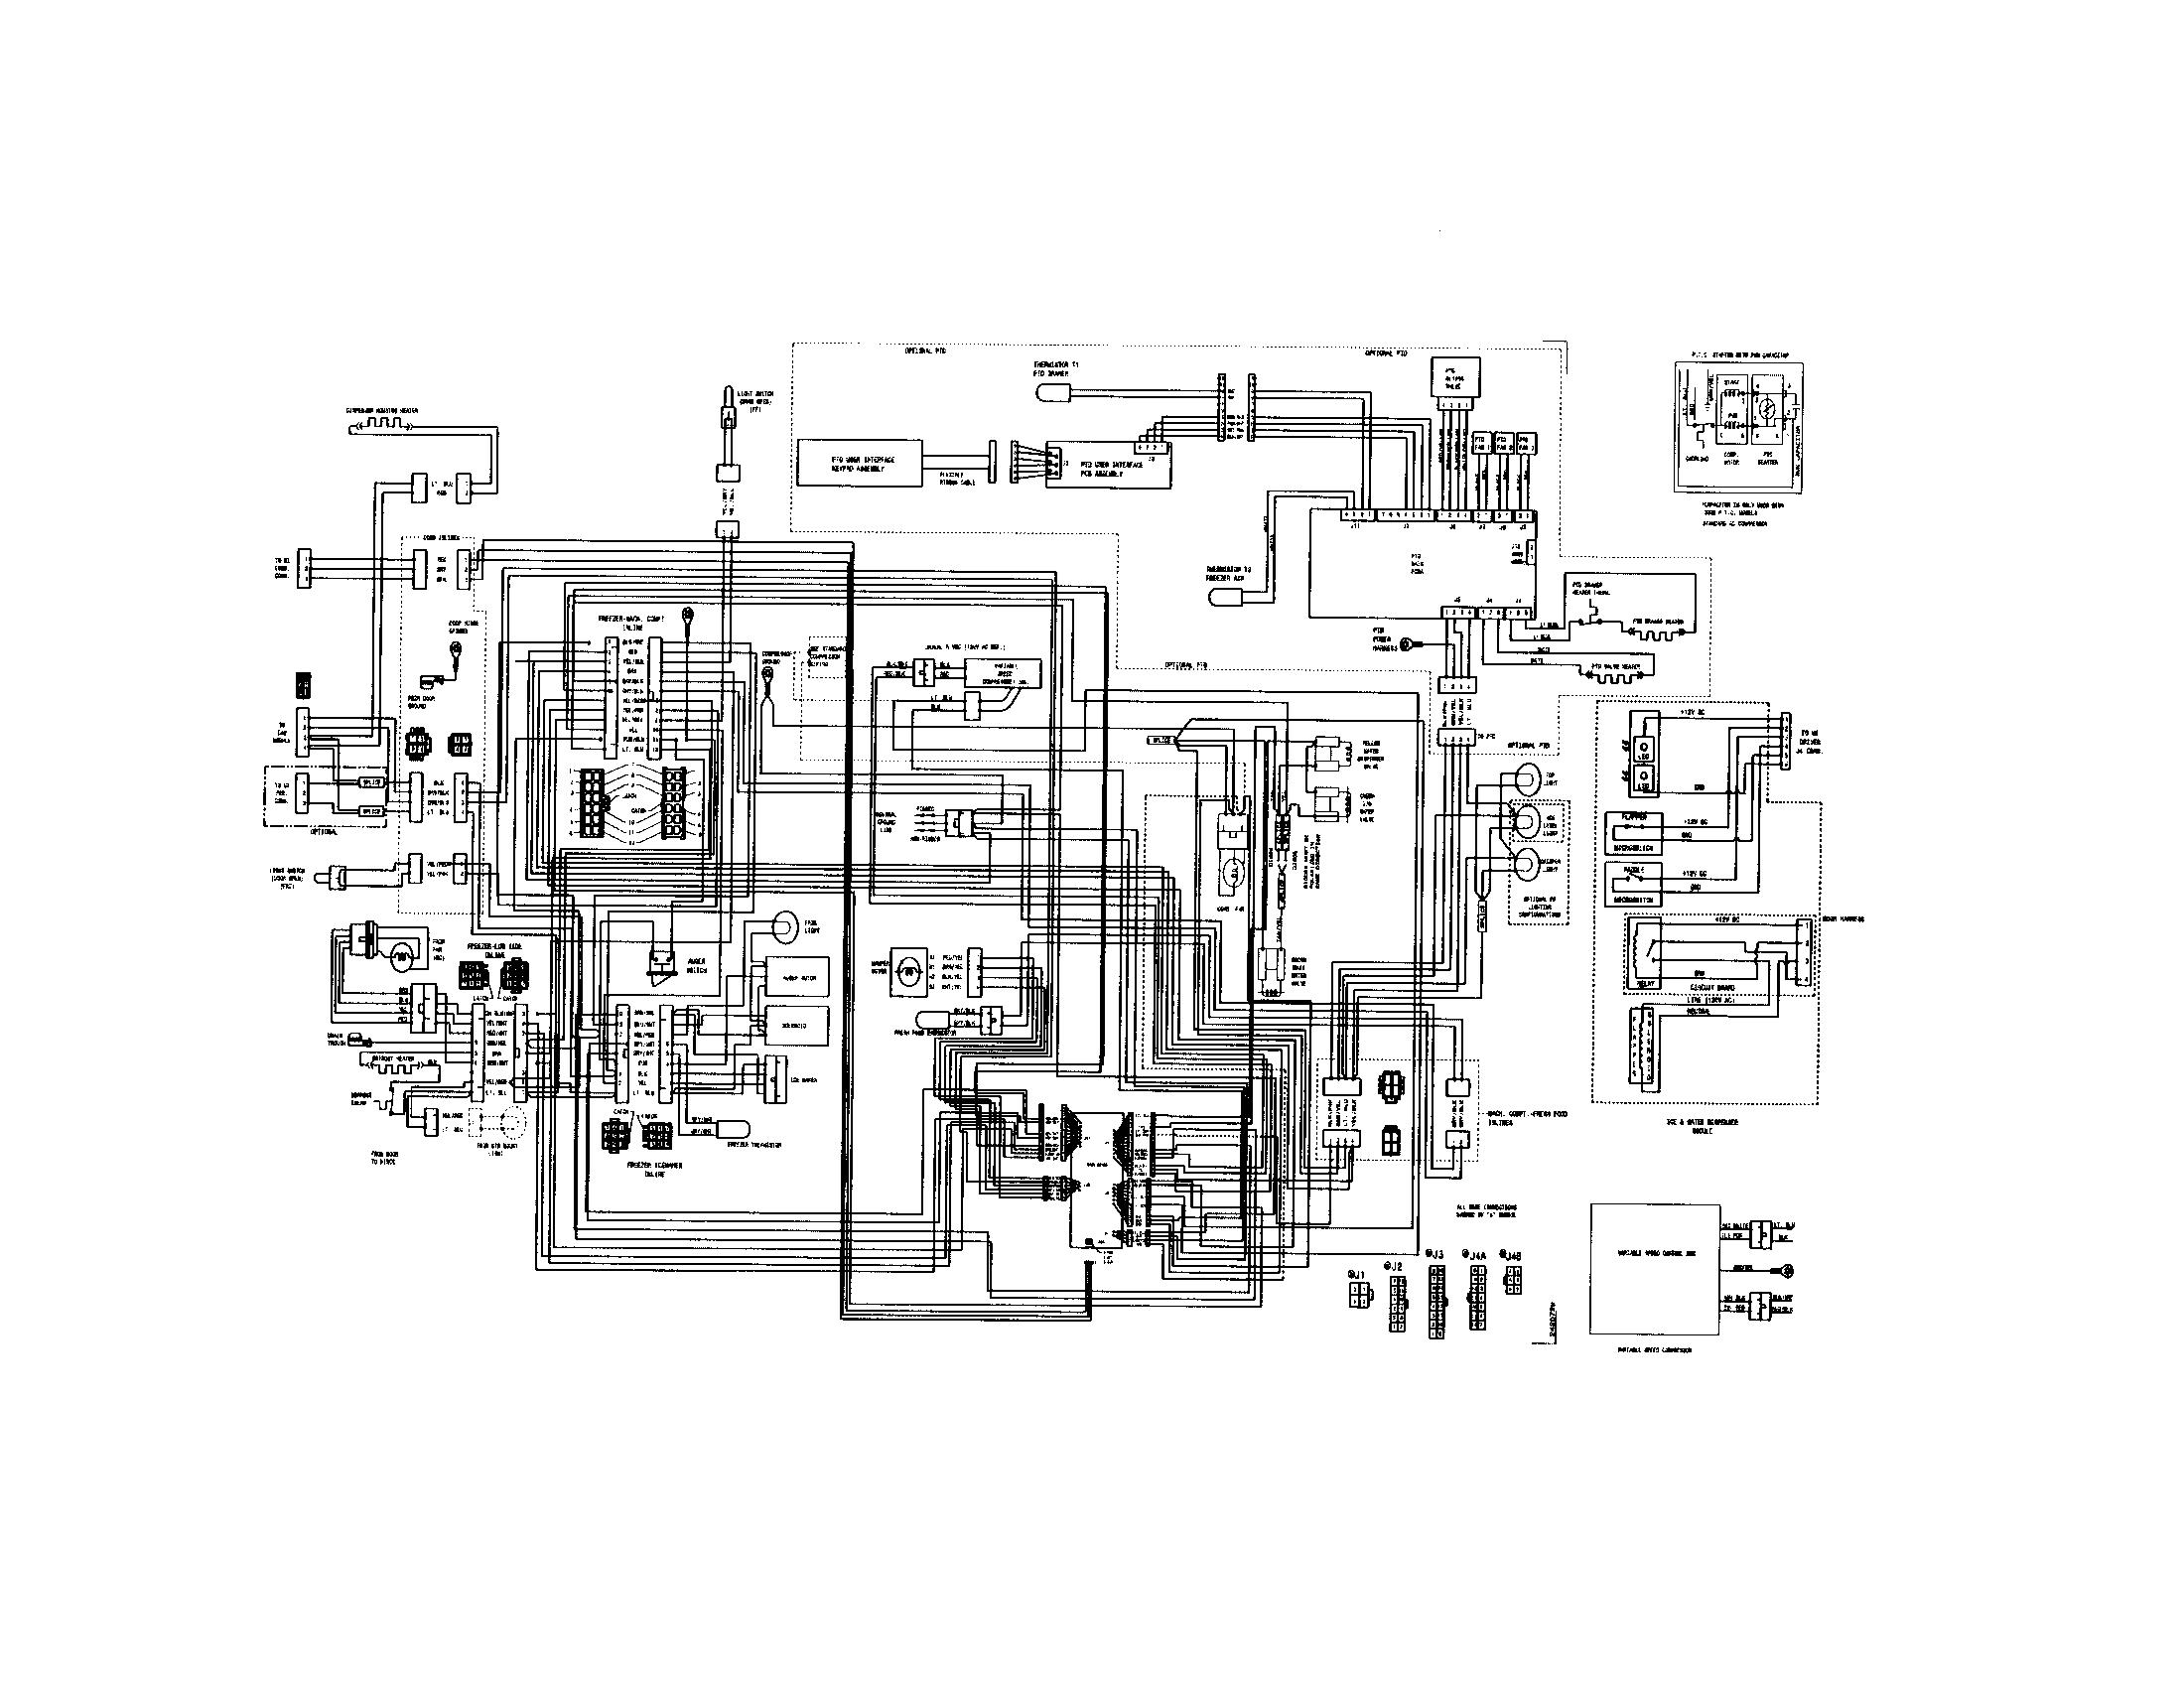 Refrigerators Parts: Frigidaire Refrigerator Parts Diagram